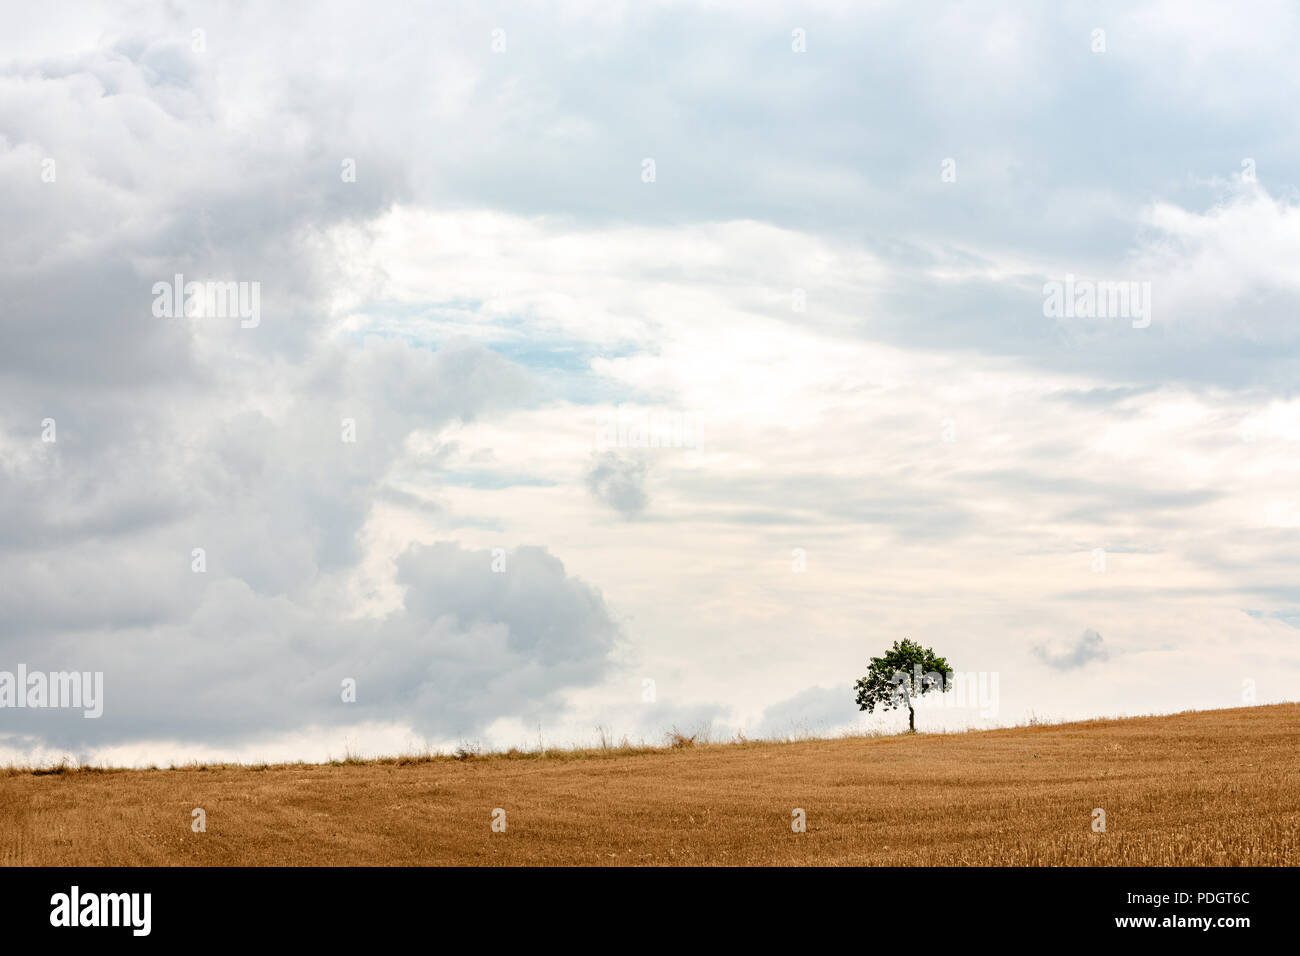 Empty minimalist landscape with one tree on the horizon Stock Photo